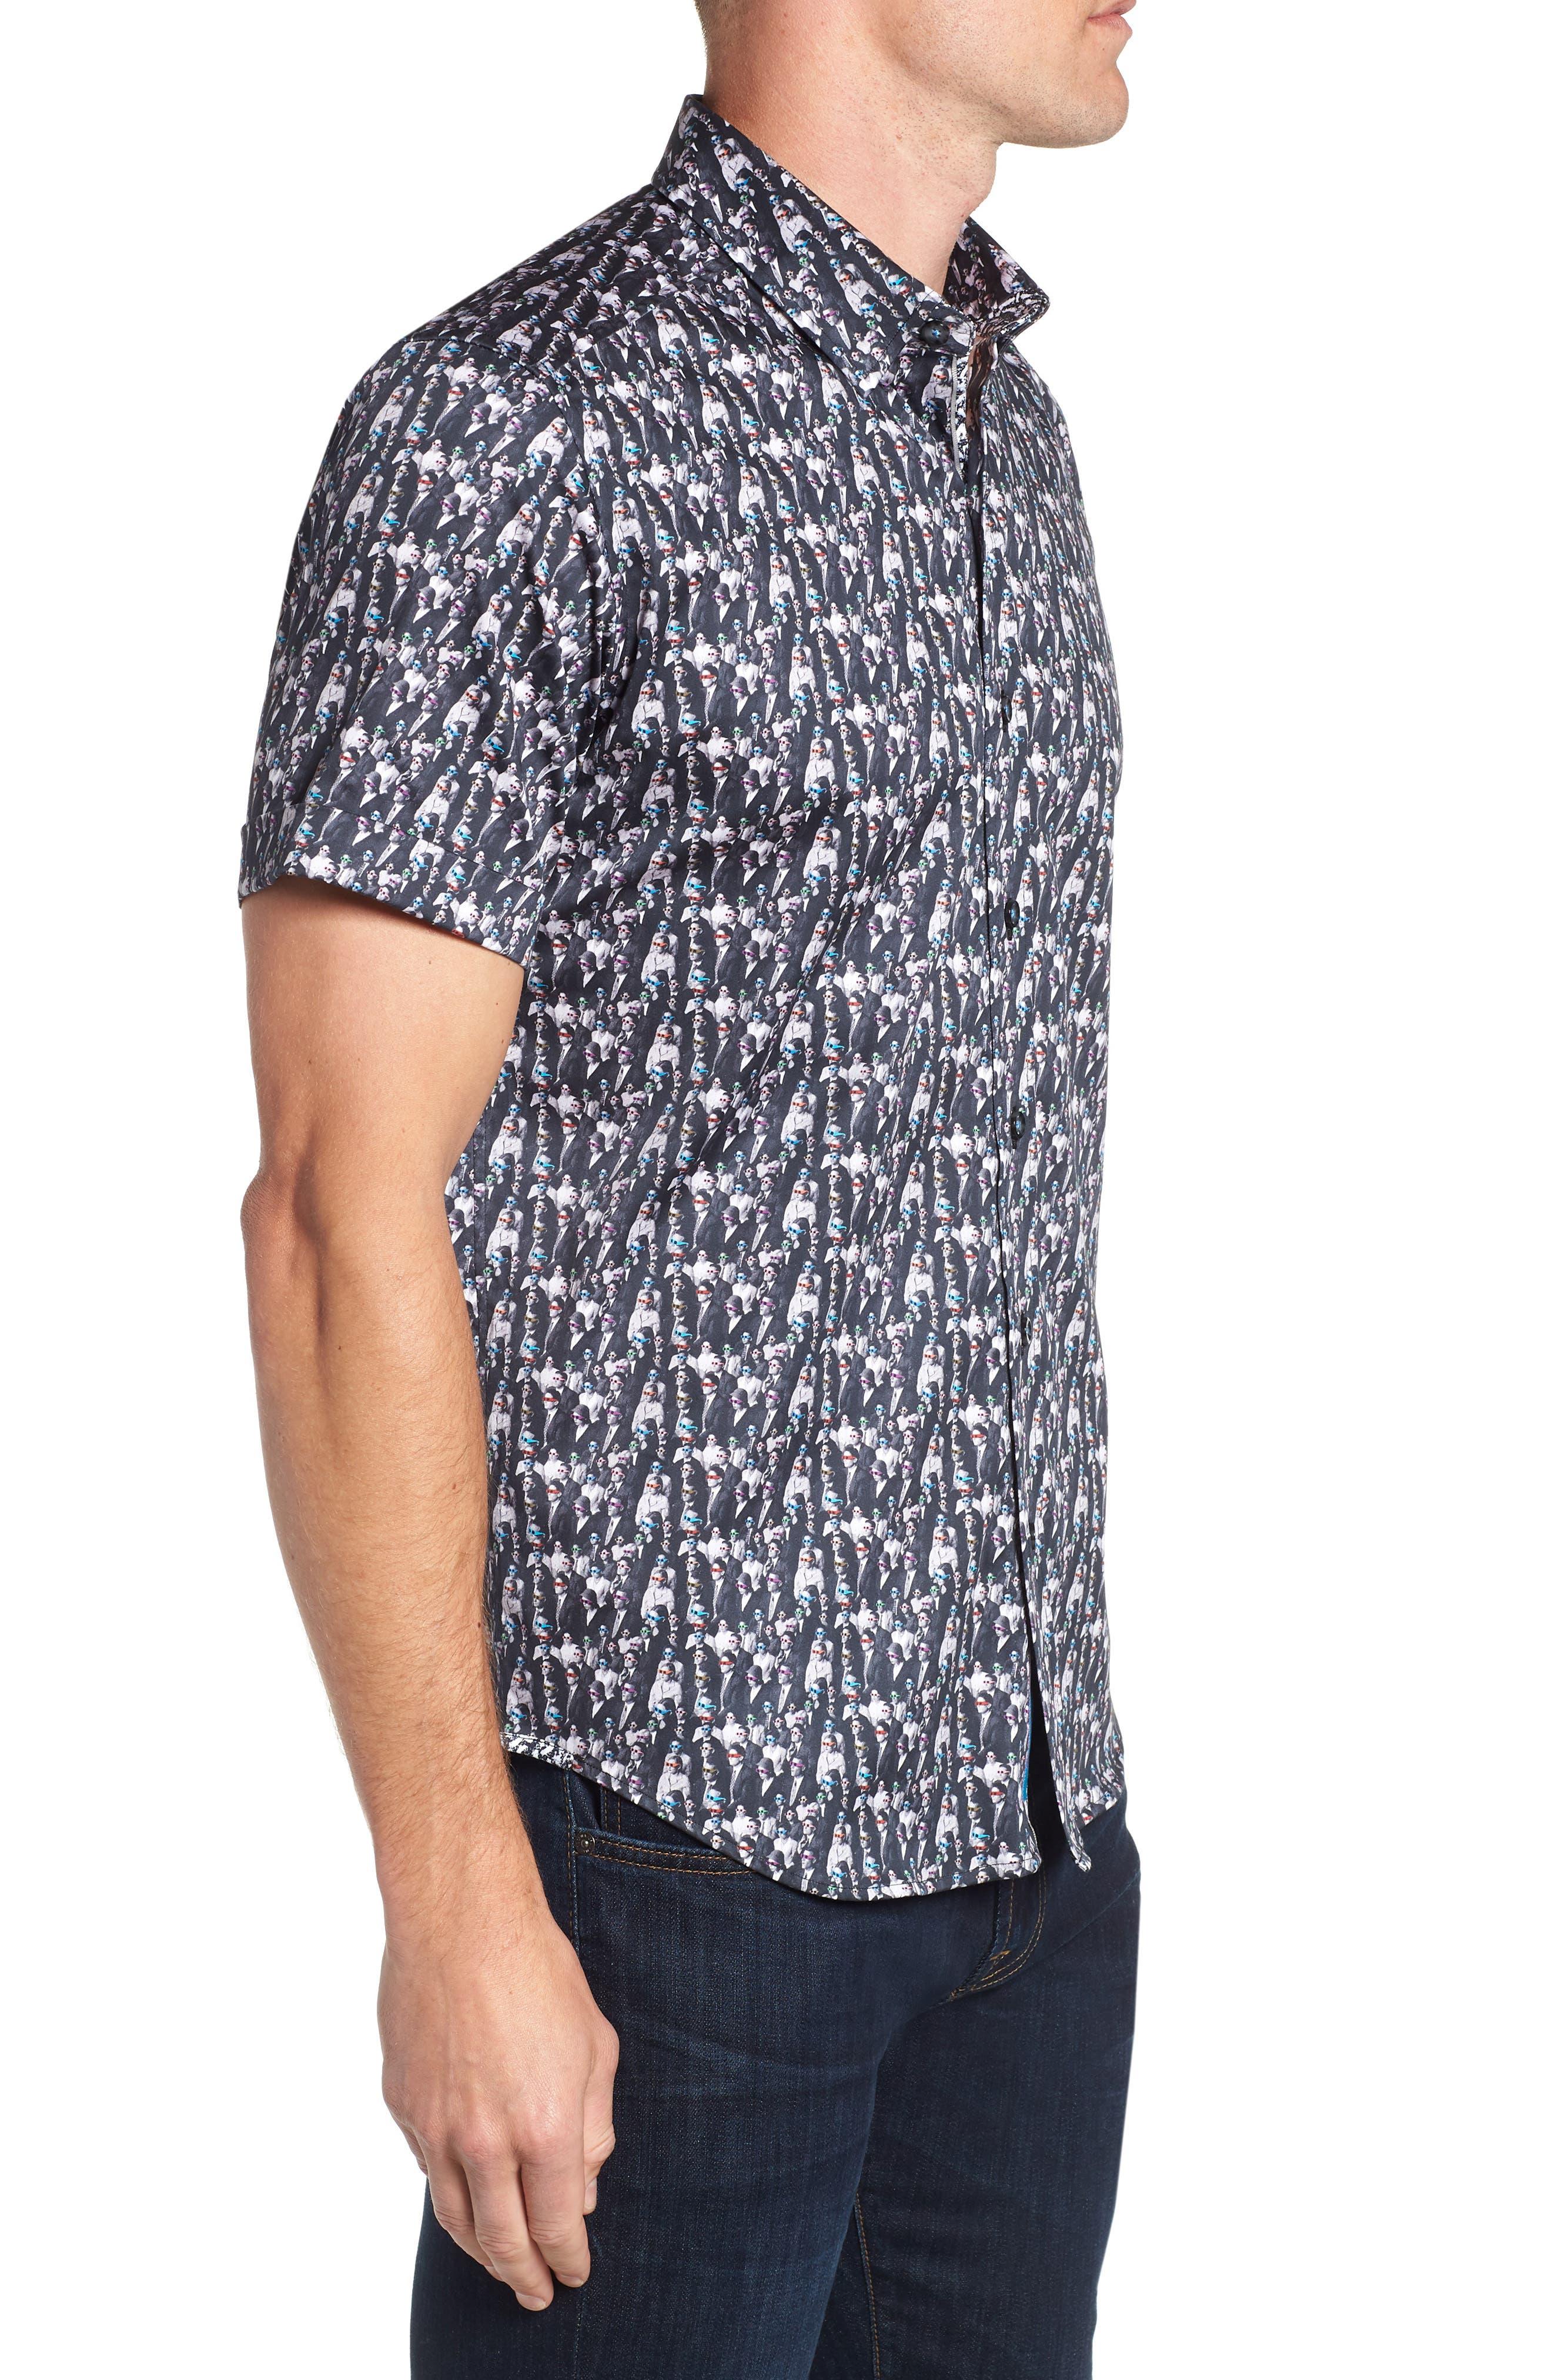 ROBERT GRAHAM,                             Cinema Tailored Fit Sport Shirt,                             Alternate thumbnail 4, color,                             001